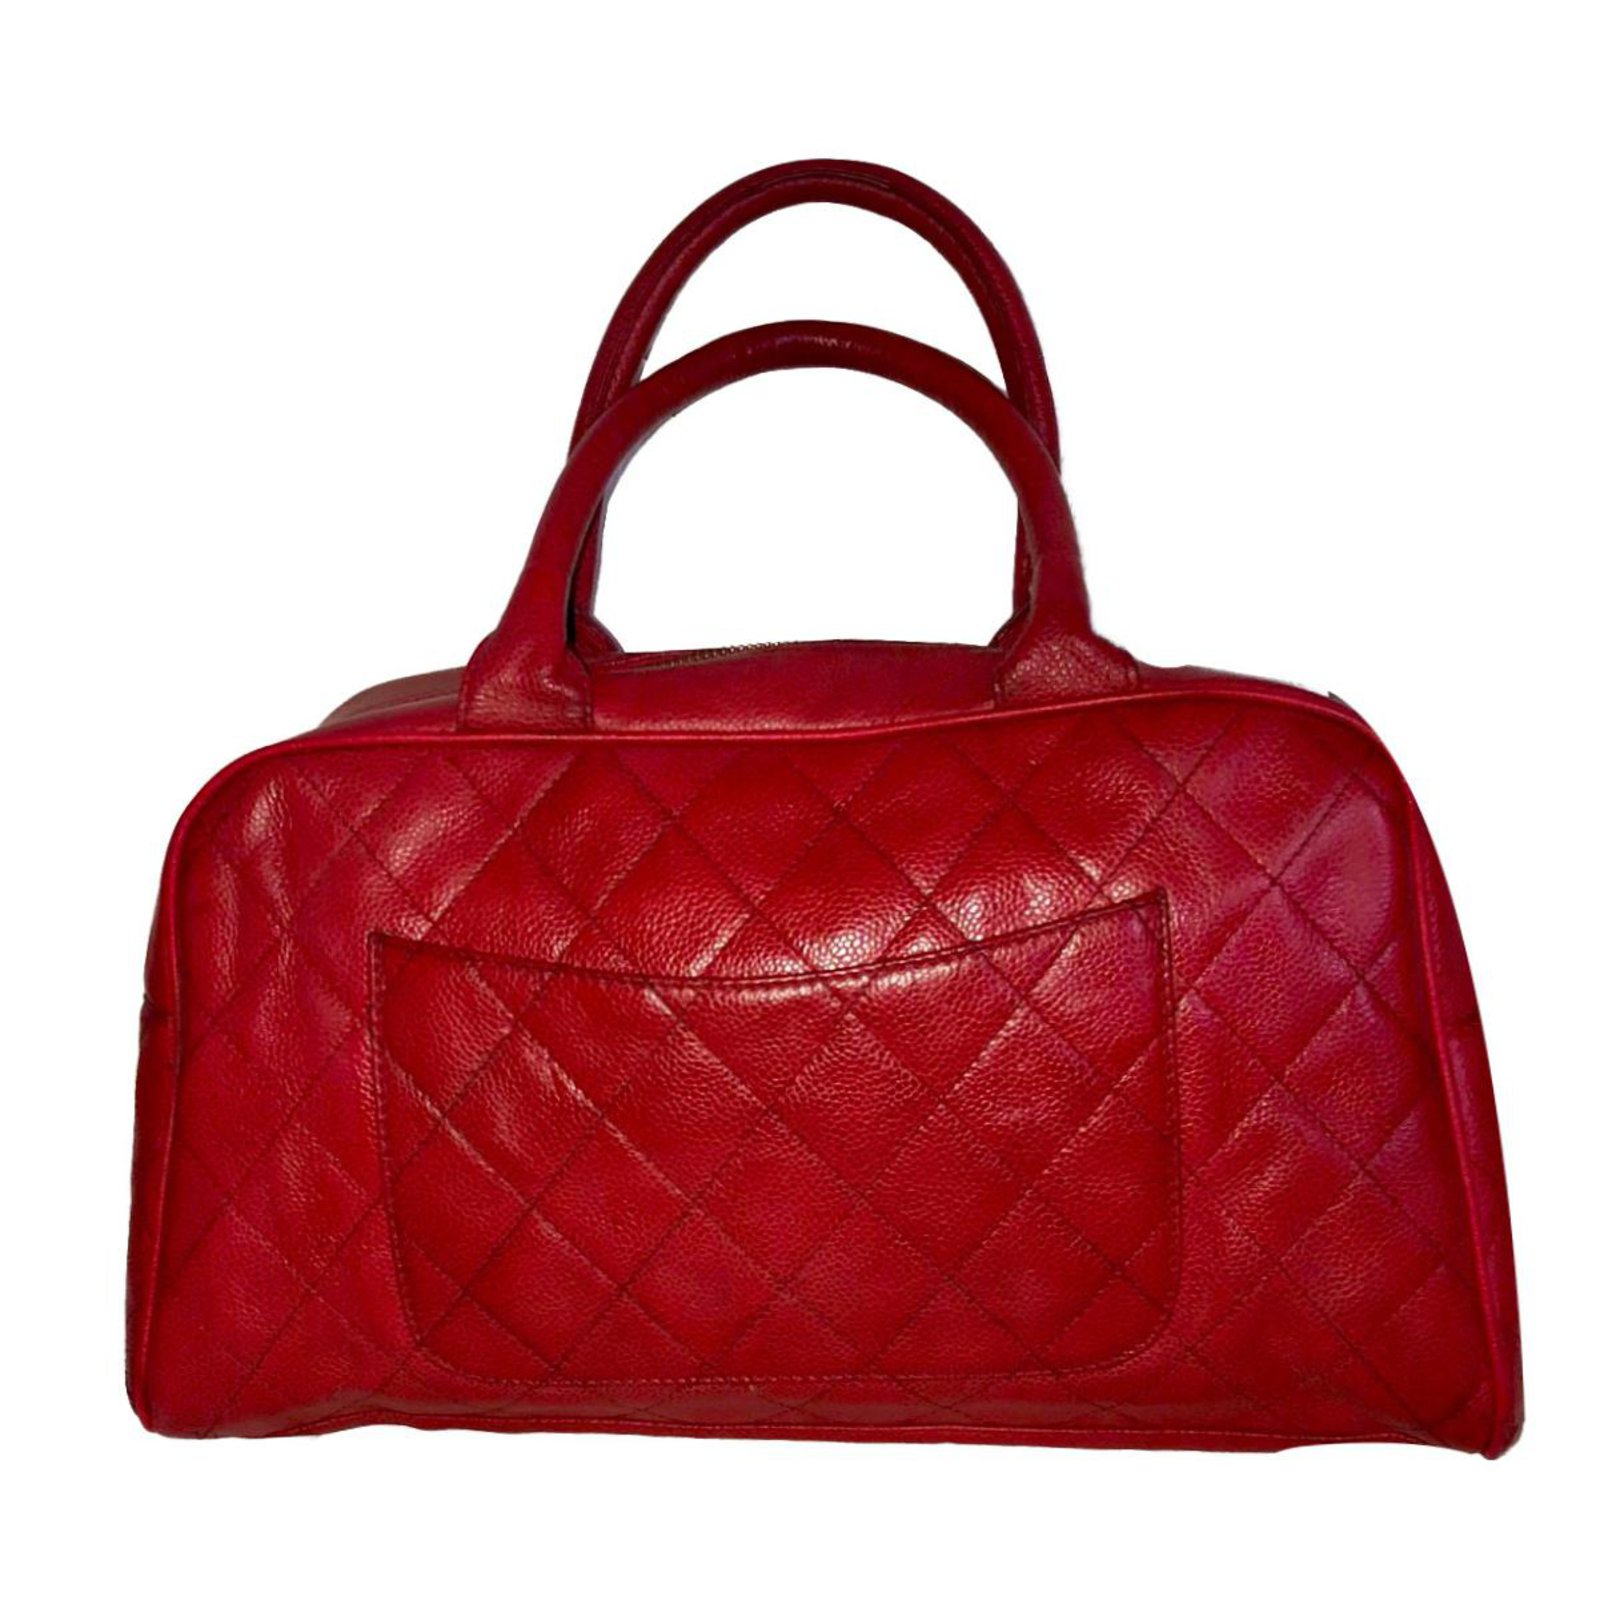 Chanel Bowling Bag Handbags Leather Dark Red Ref 72535